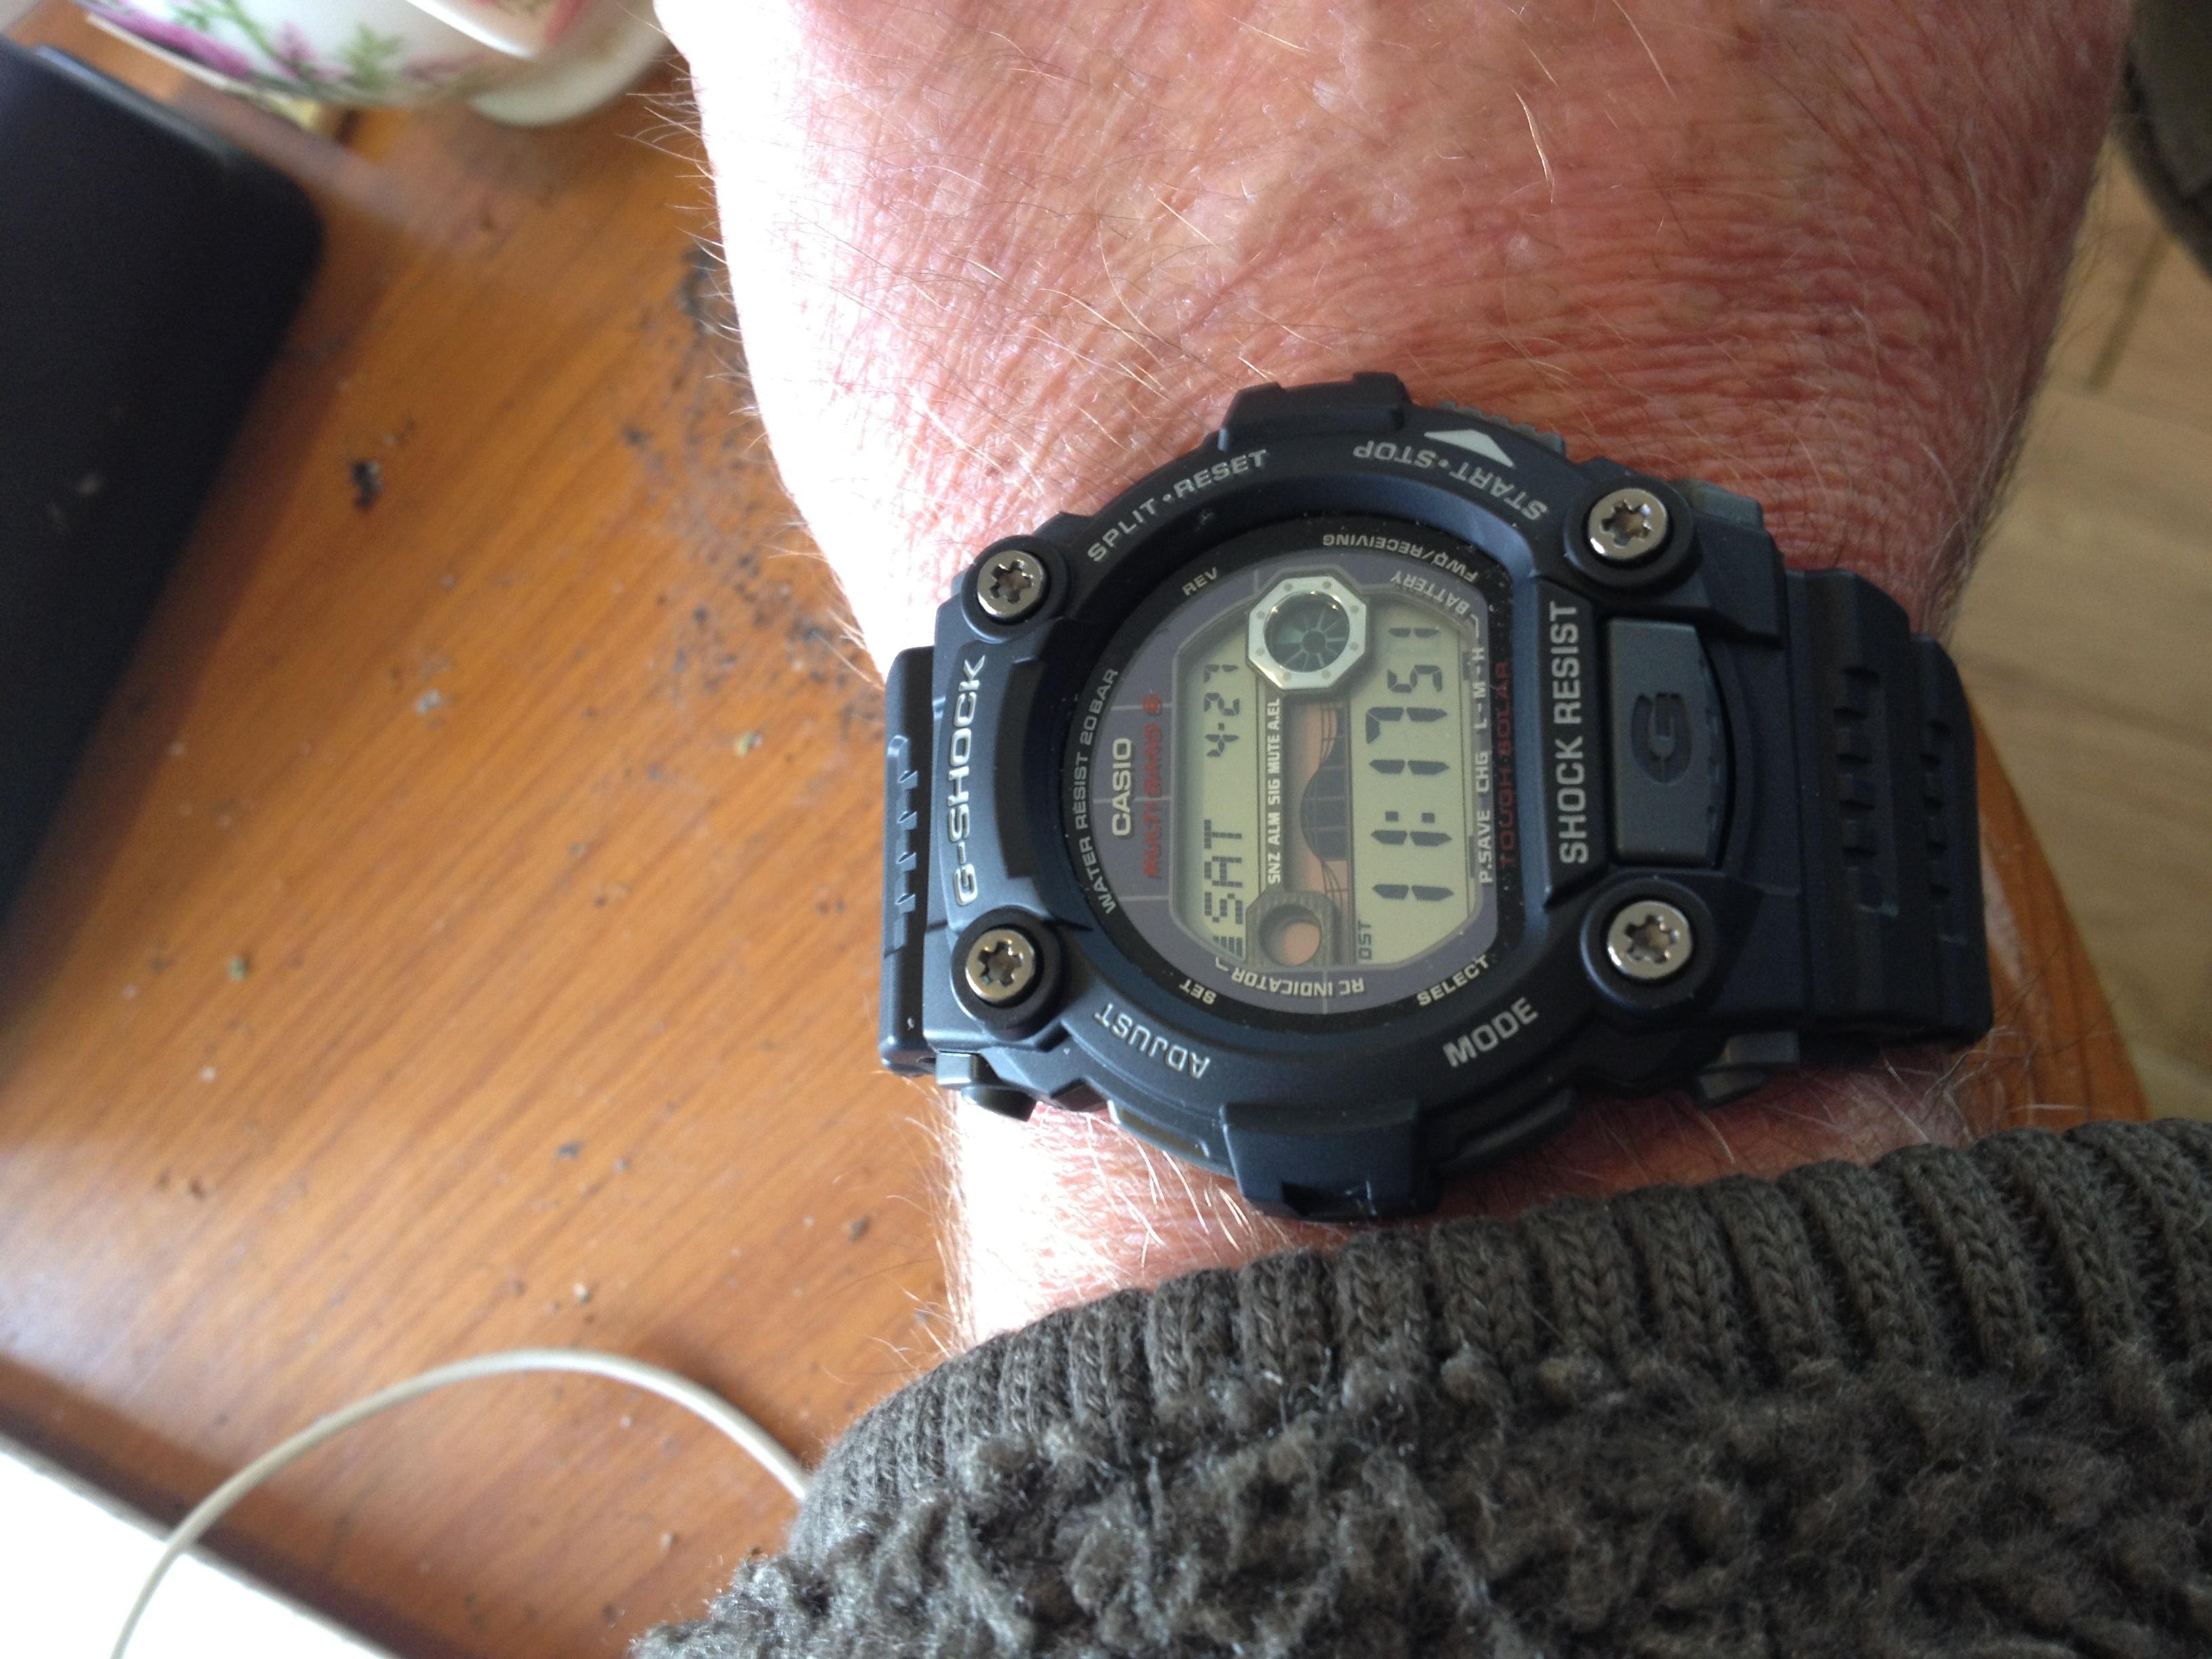 d38c76d0efc9 Gents Casio G-Shock G-Rescue Alarm Chronograph Watch (GW-7900-1ER ...